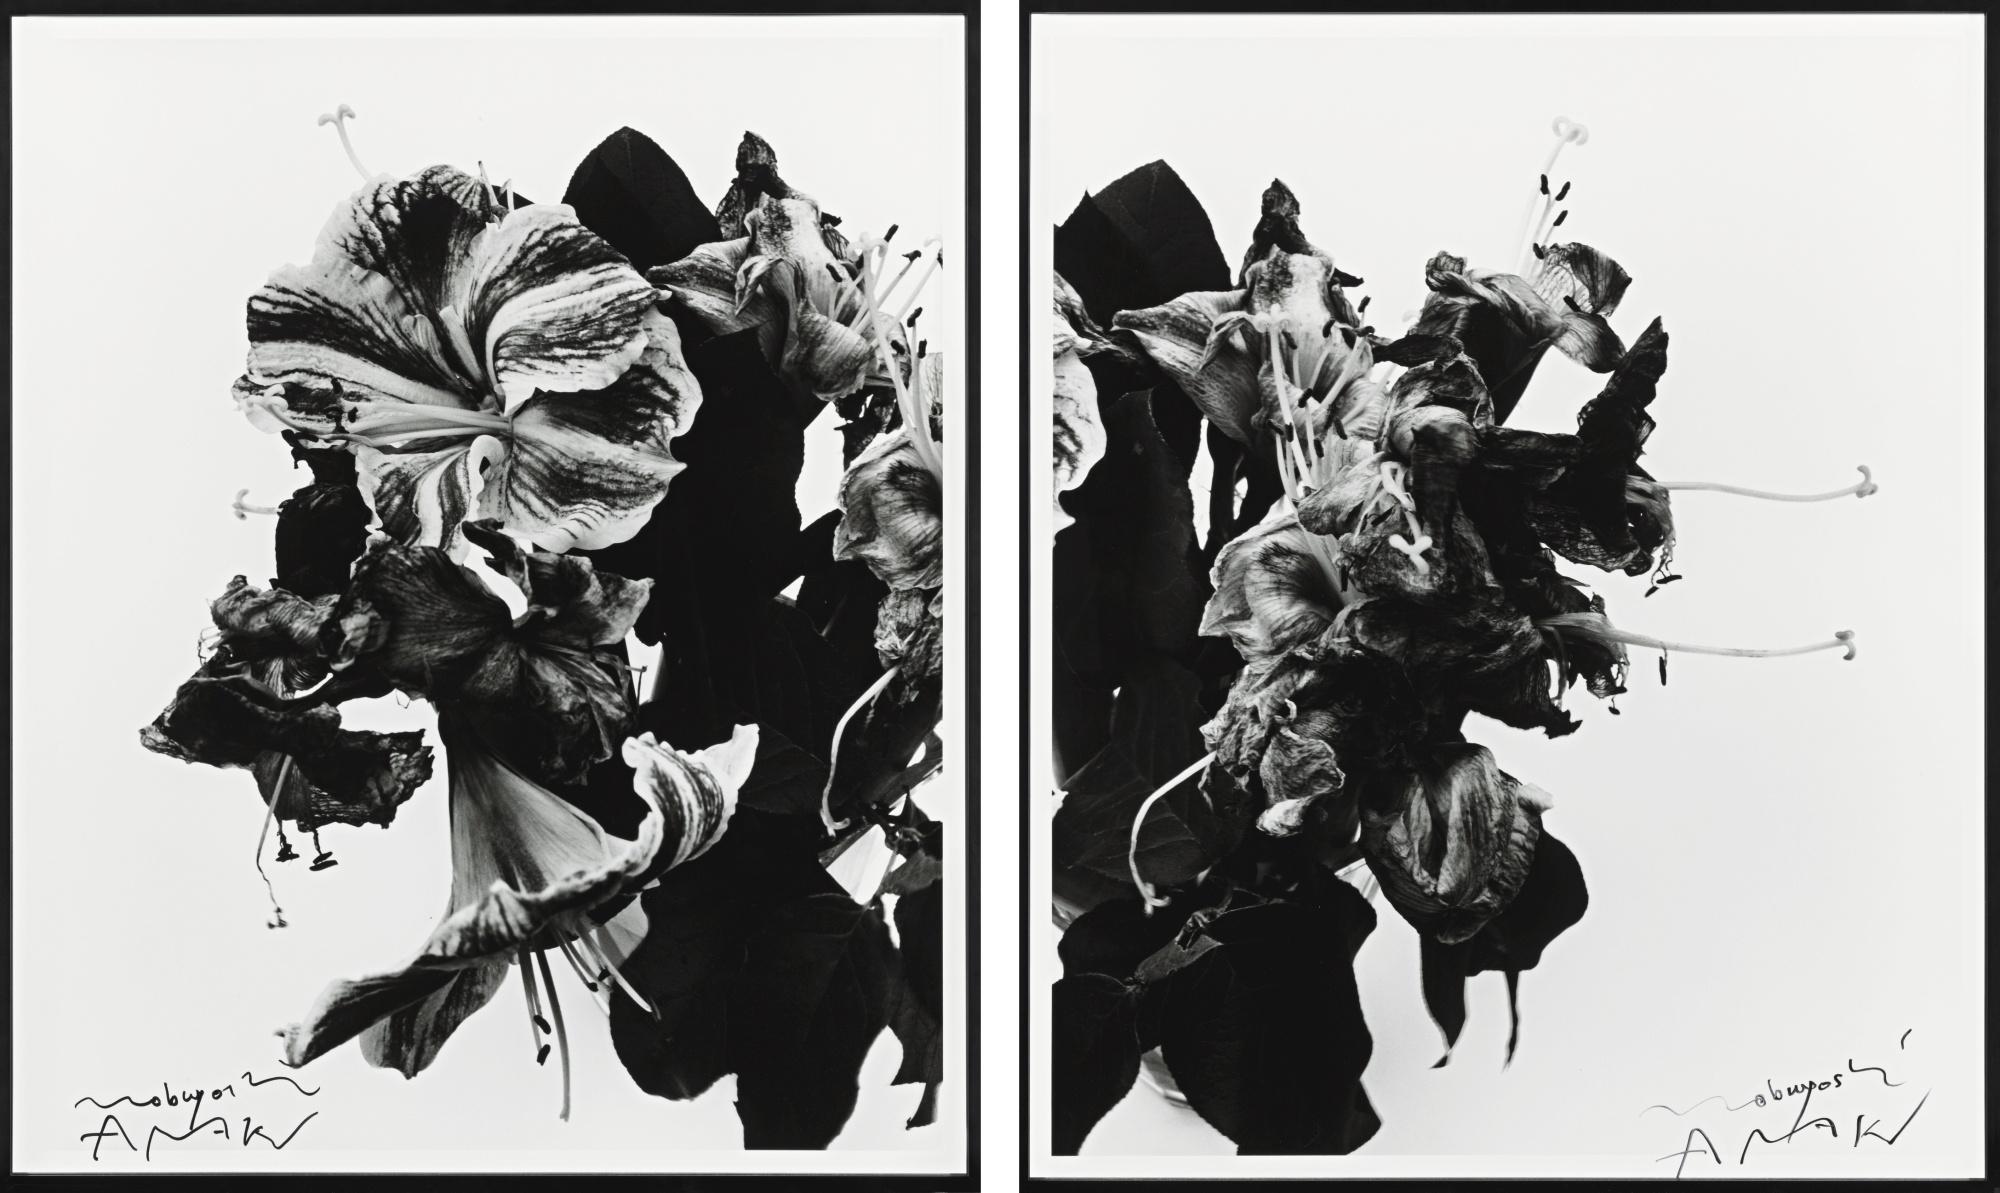 Nobuyoshi Araki-From Close To Range [Diptych]-1991